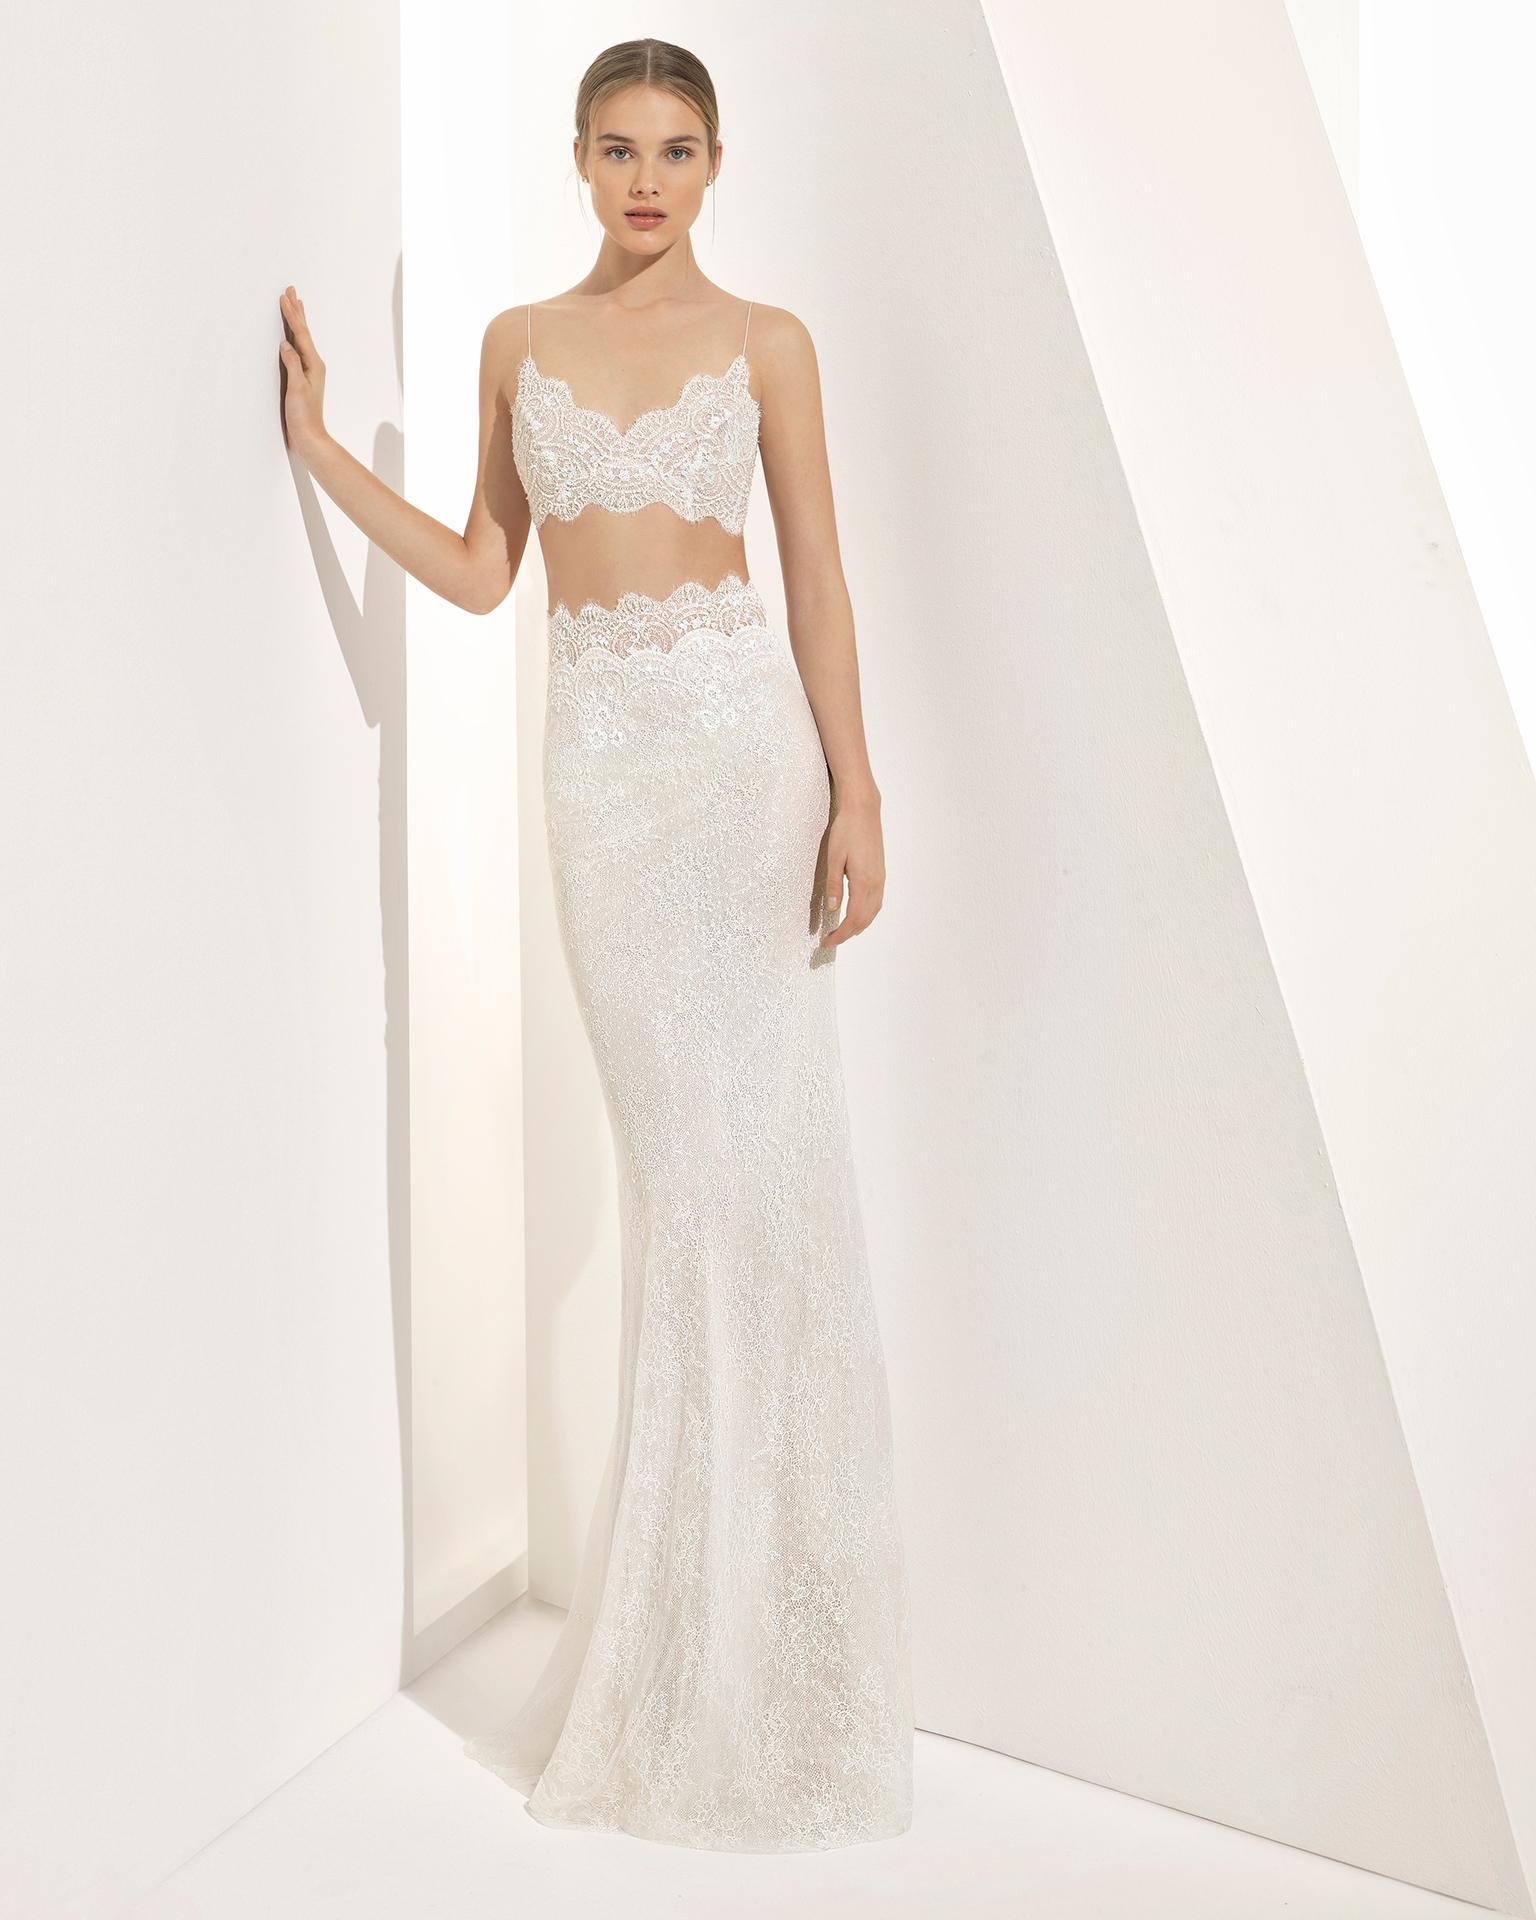 d2437b20305 PALATINO - 2018 Bridal Collection. Rosa Clará Couture Collection